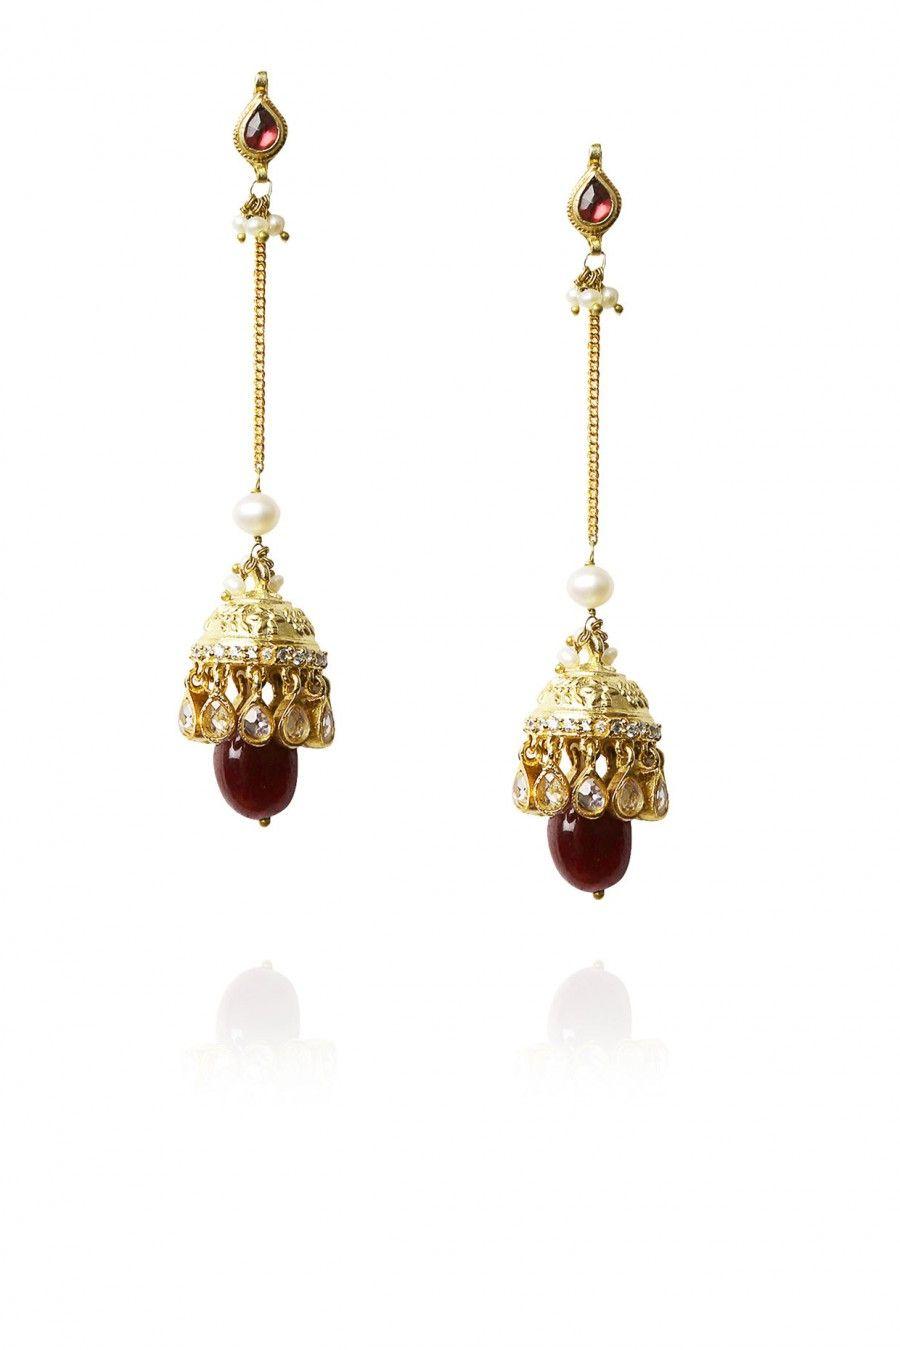 Perniaspopupshop Earring Artkarat Jewellery Shopnow Happyshopping Gold Jhumka Earrings Jewelry For Her Beautiful Jewelry